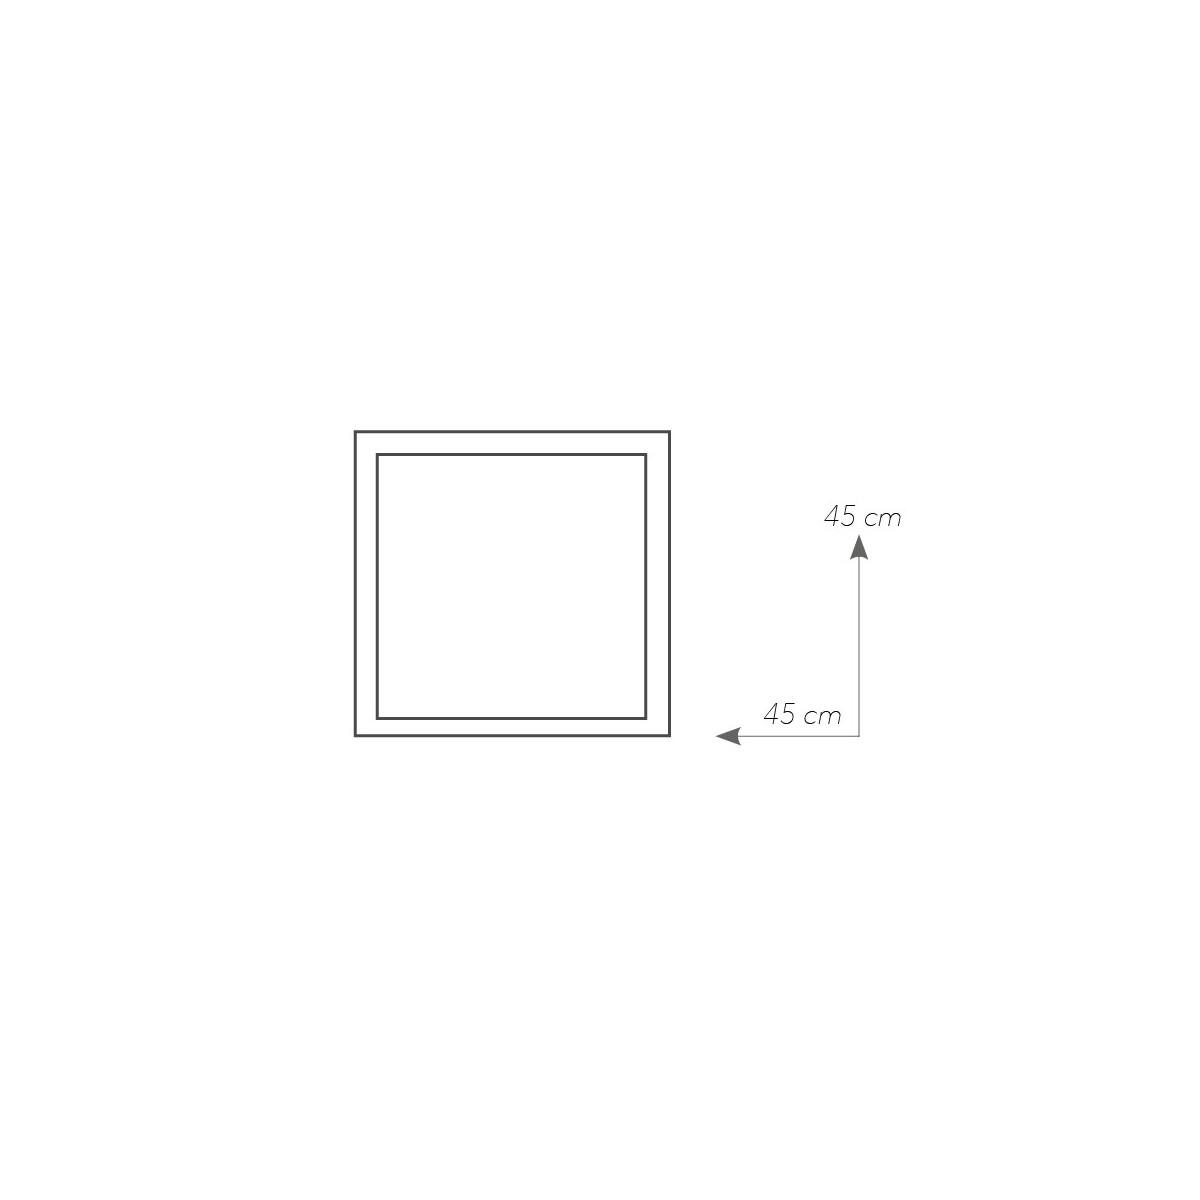 I-GLAMOUR/PL45Q - Plafoniera Vetro Bianco Quadrata Cornice Scacchi Moderna Led 24 watt Luce Naturale